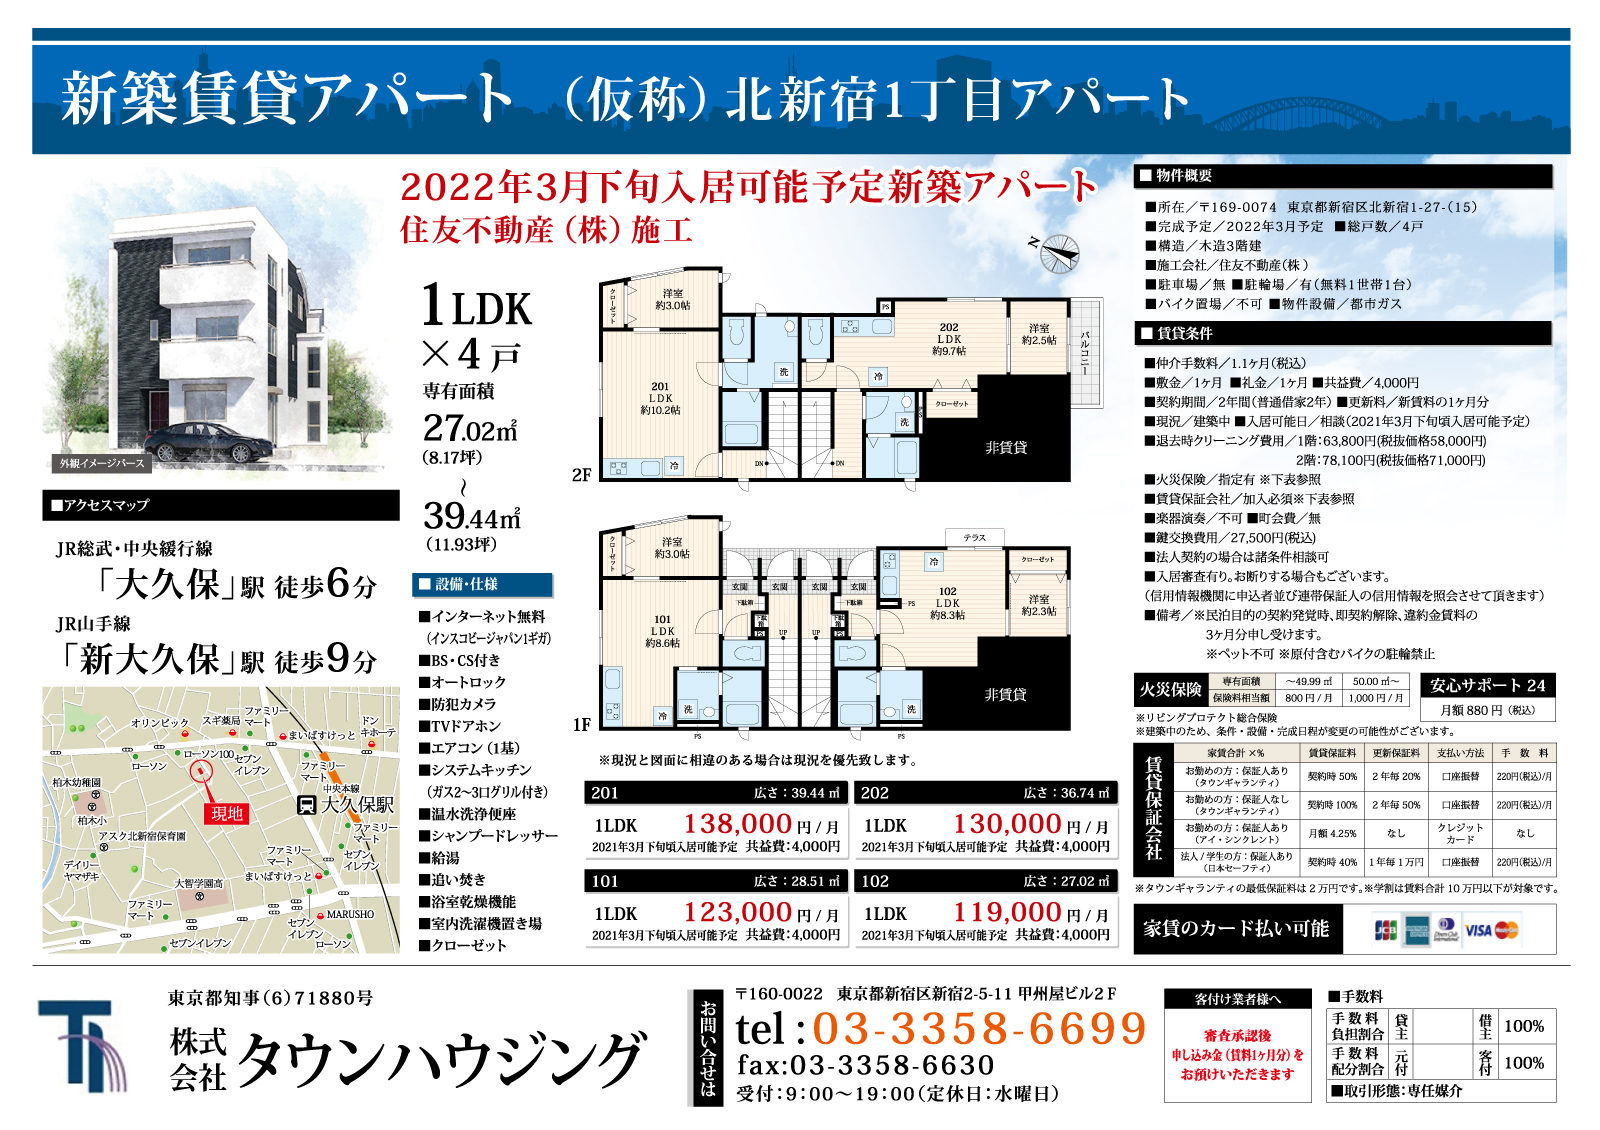 JR総武・中央線 大久保駅 徒歩6分 1LDK 新大久保駅9分